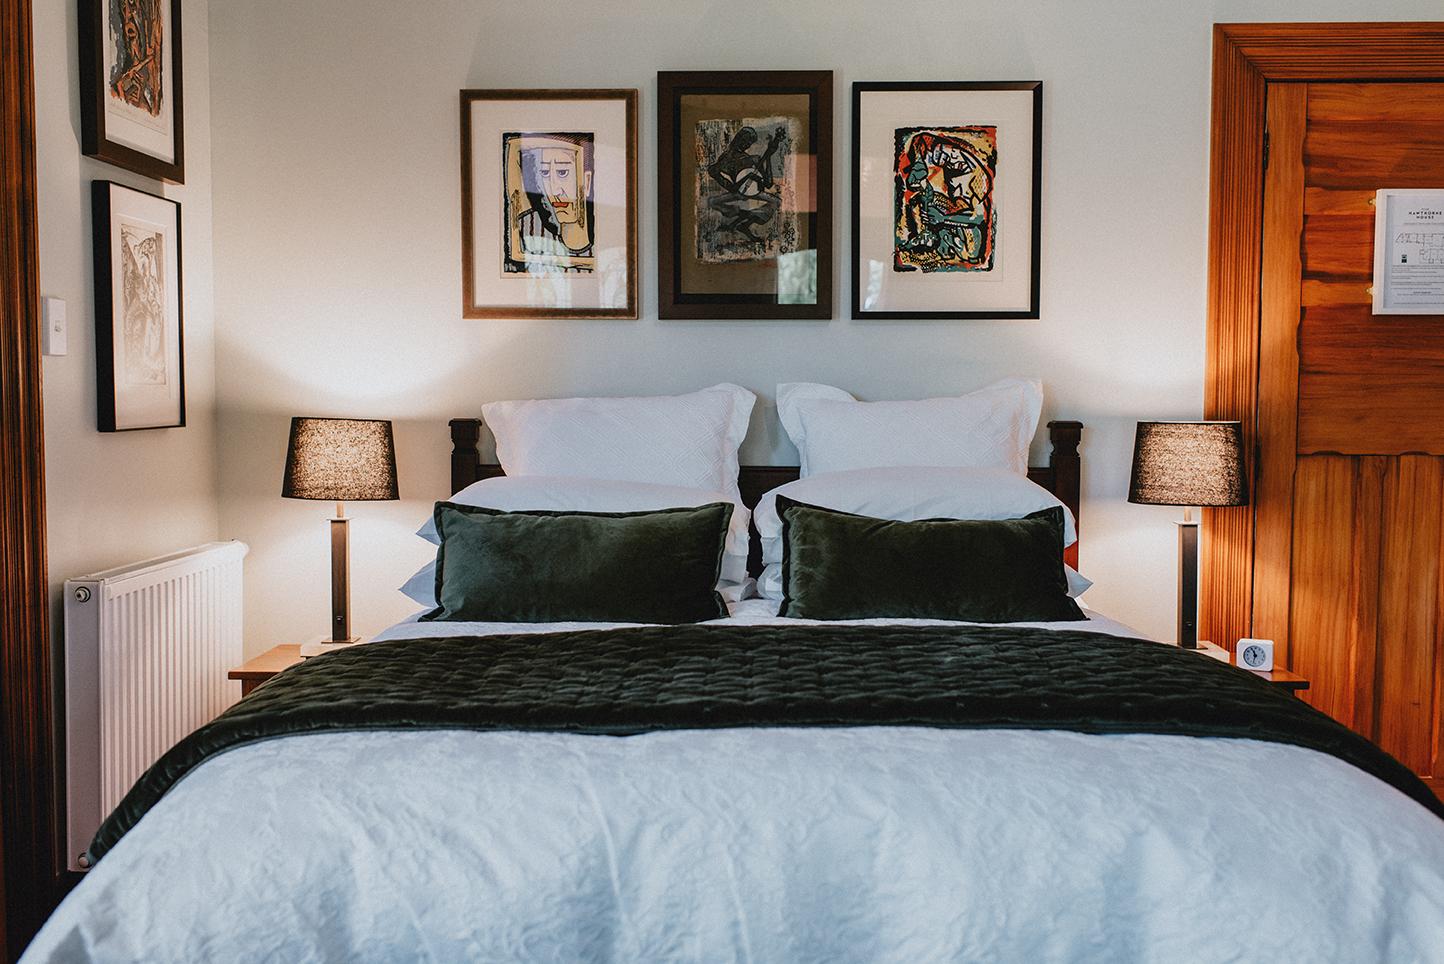 Kakariki Room Queen Sized Bedroom